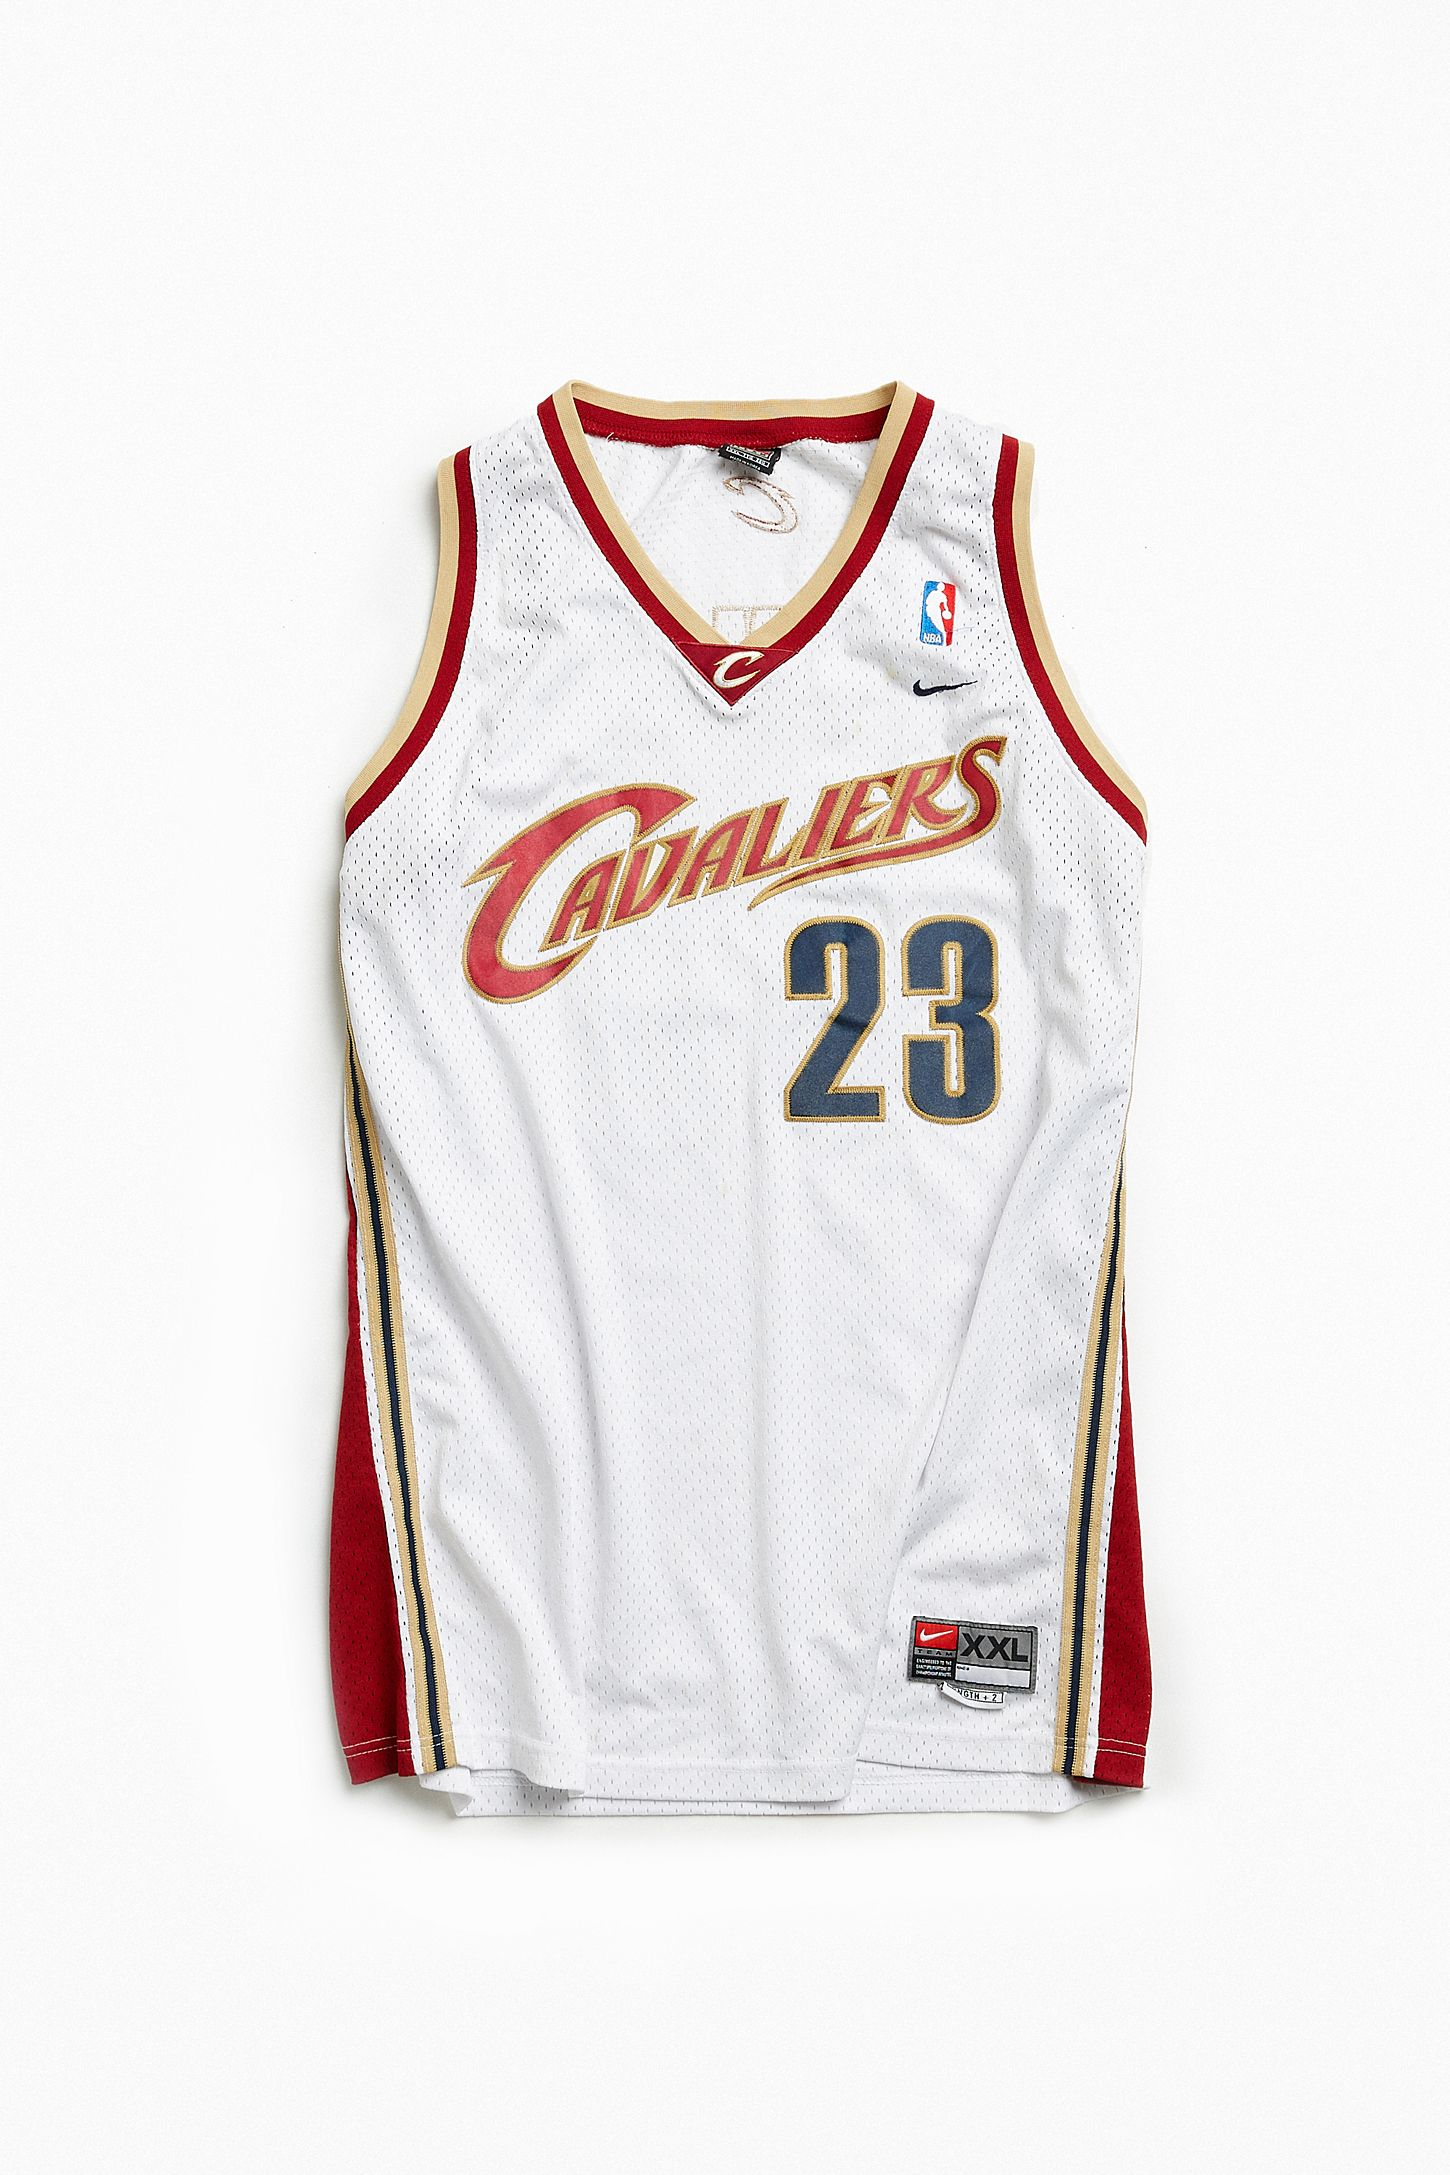 cab959887 Vintage NBA Cleveland Cavaliers LeBron James Basketball Jersey ...